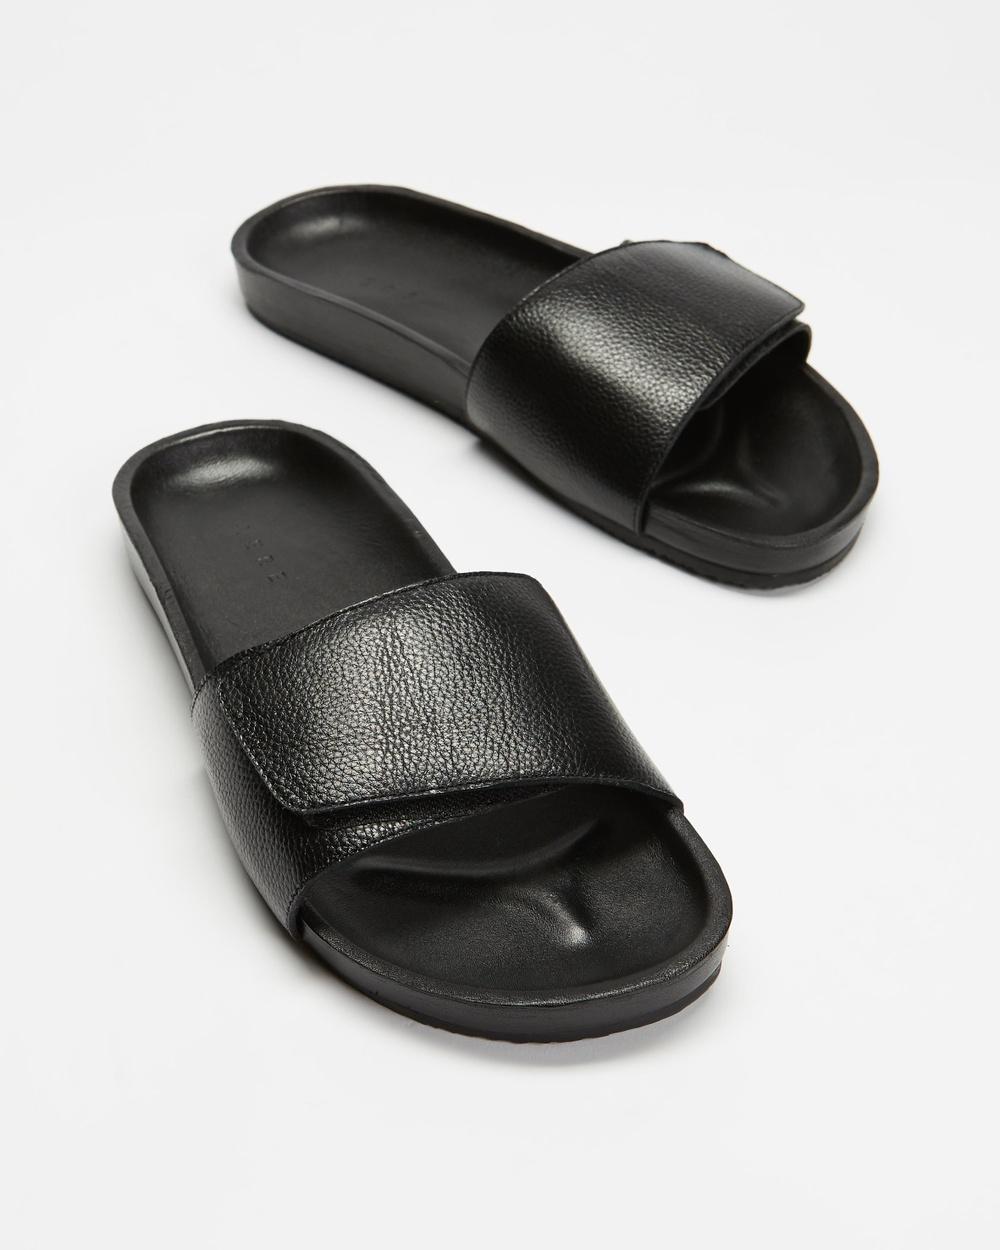 AERE Tenere Leather Slides Sandals Black